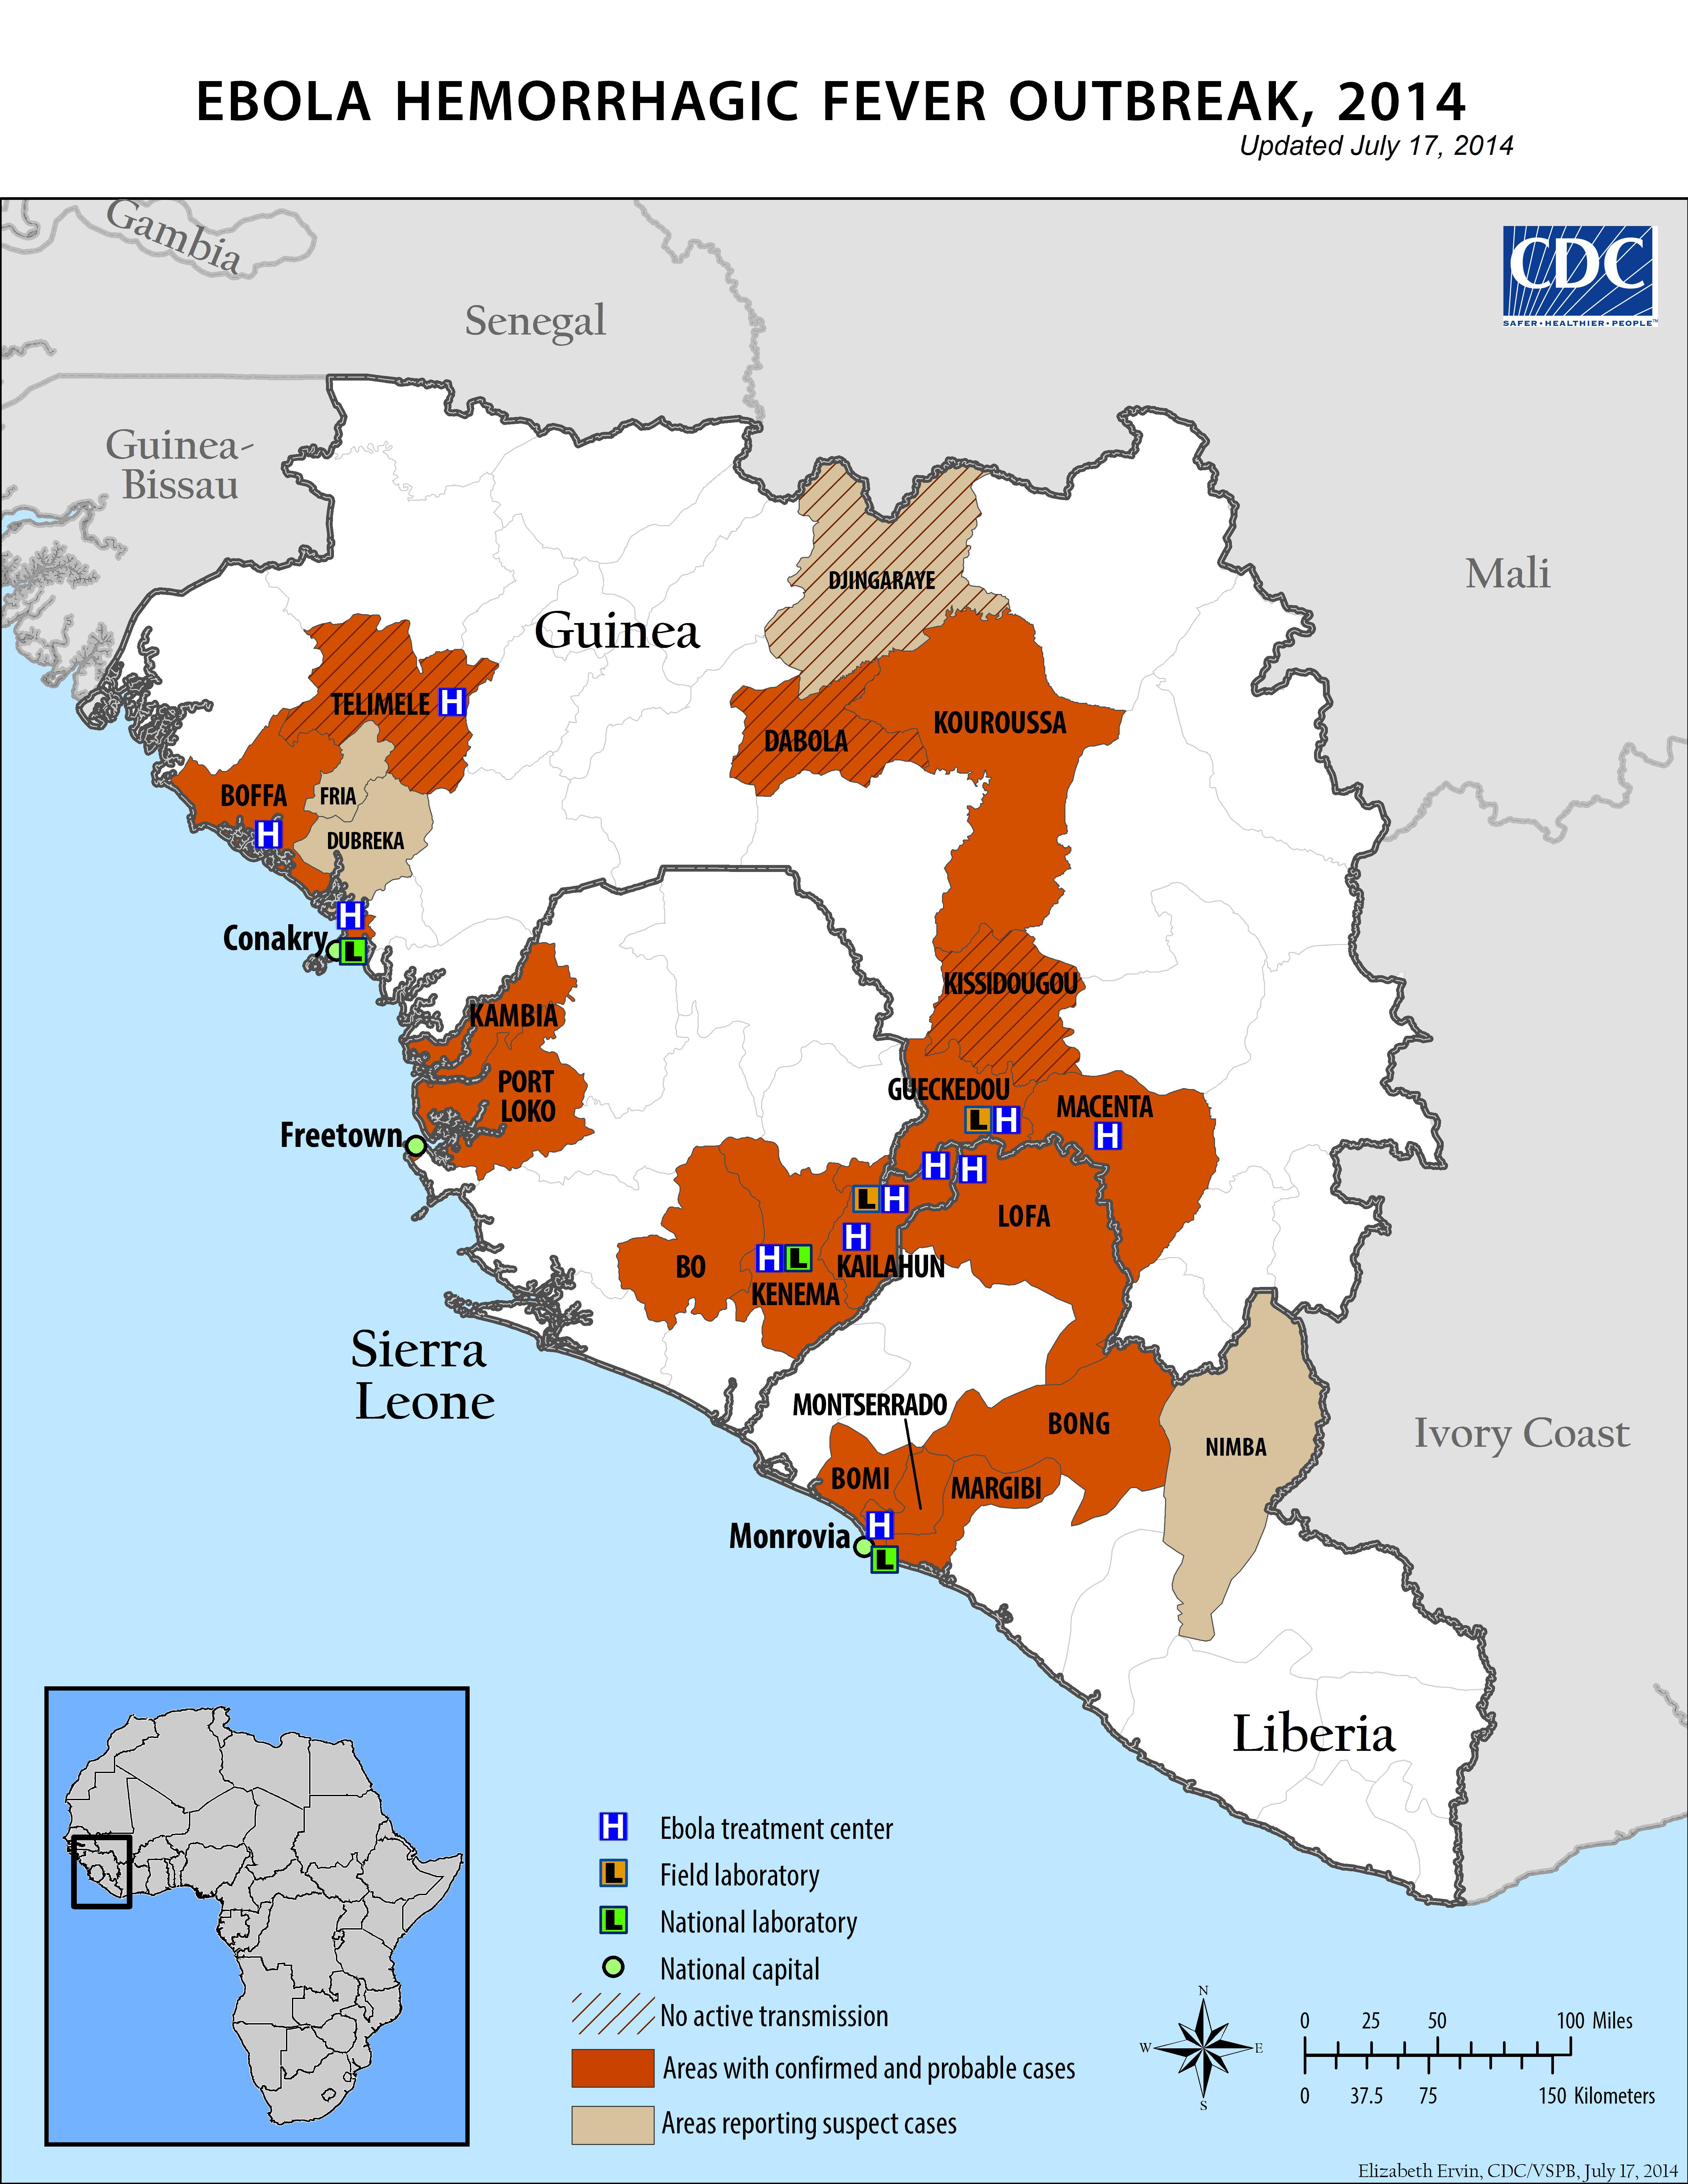 Ebola hemorrhagic fever outbreak, 2014 : updated July 17, 2014